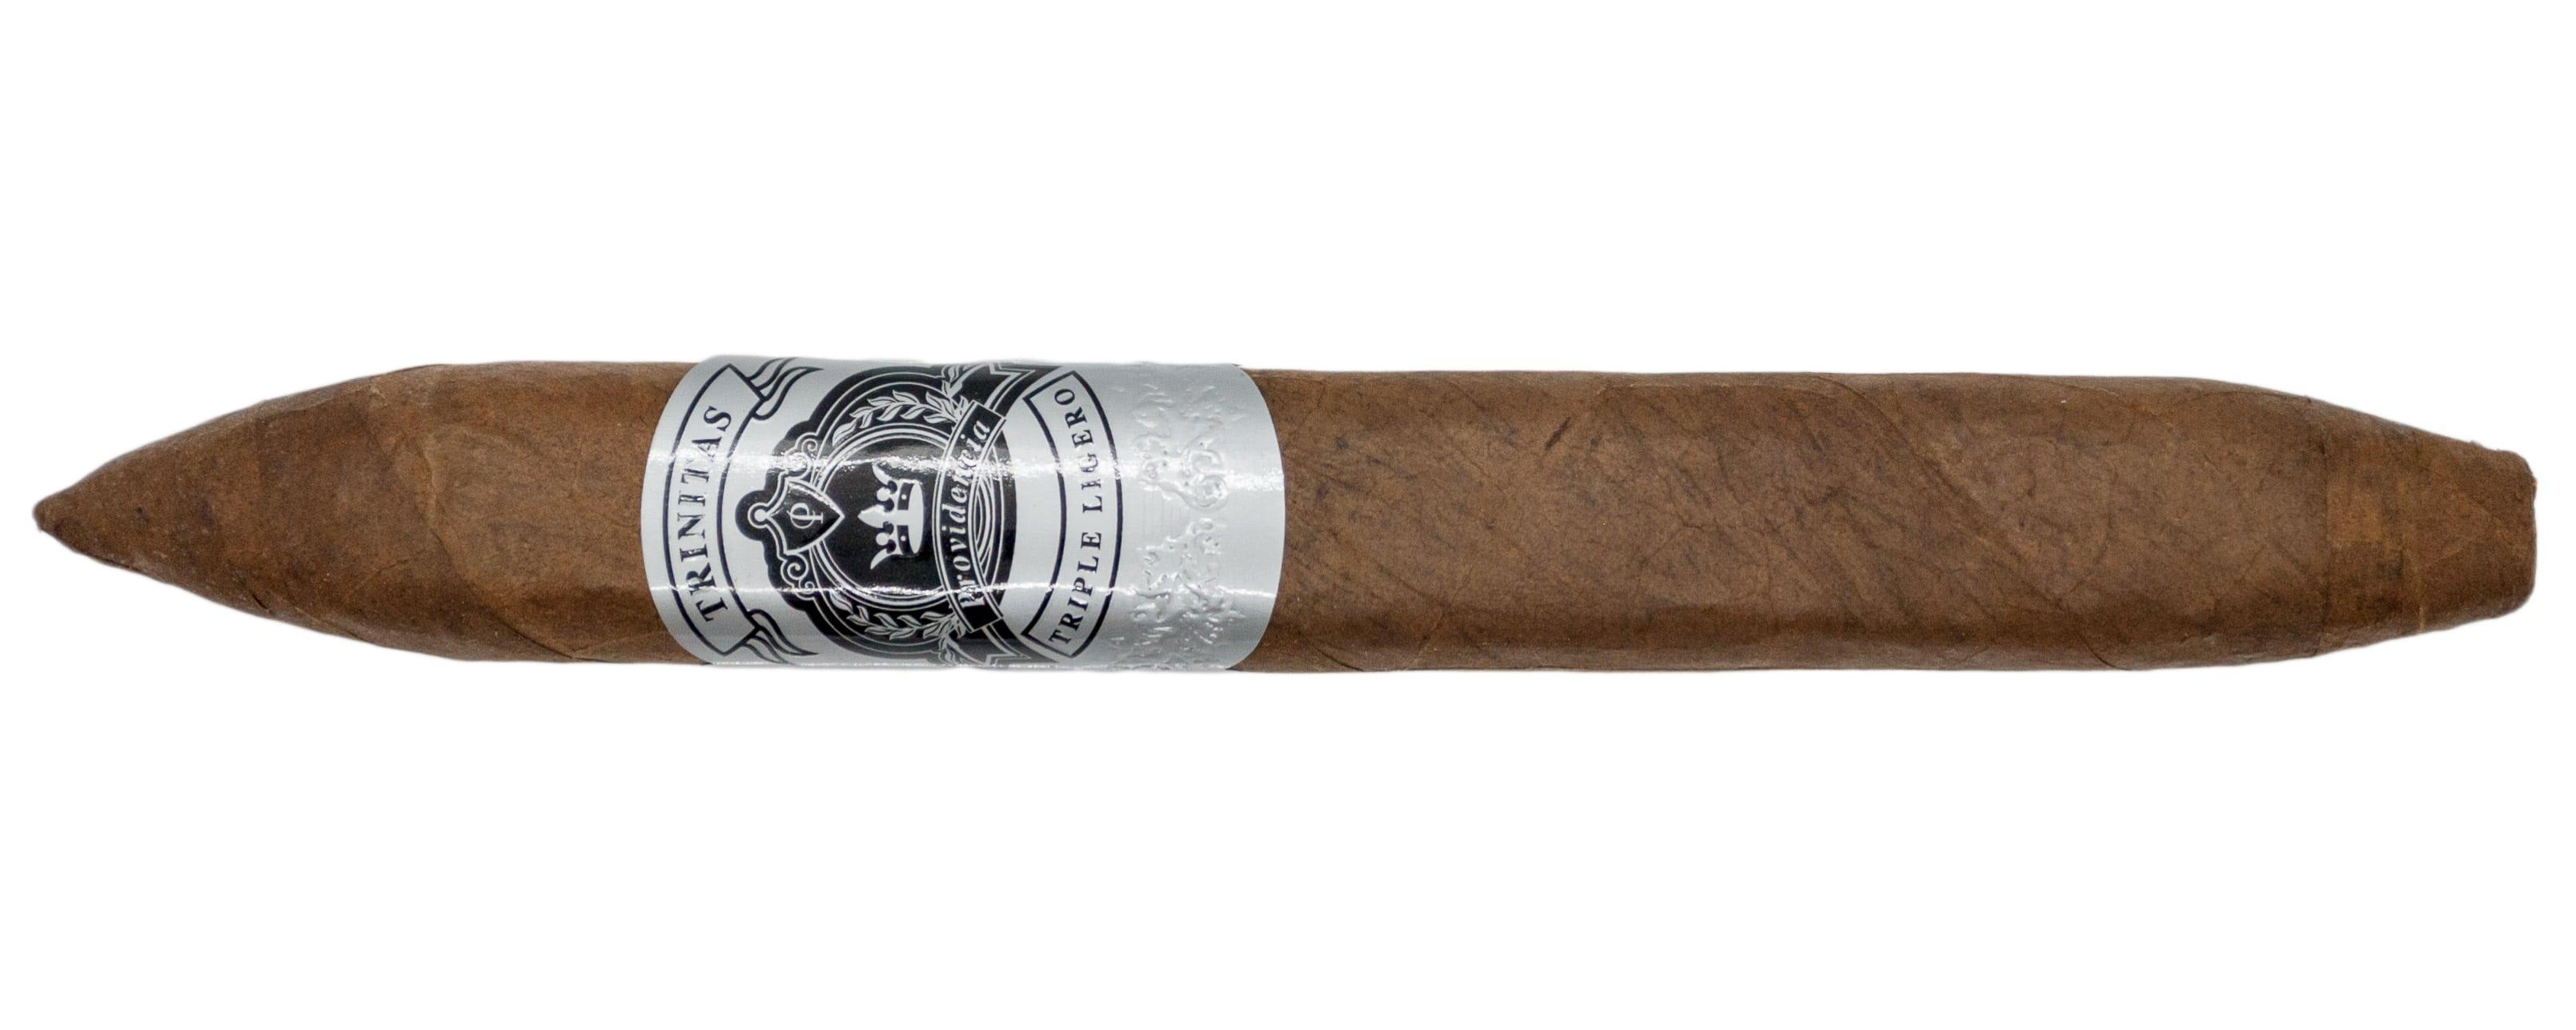 Blind Cigar Review: Providencia | Trinitas